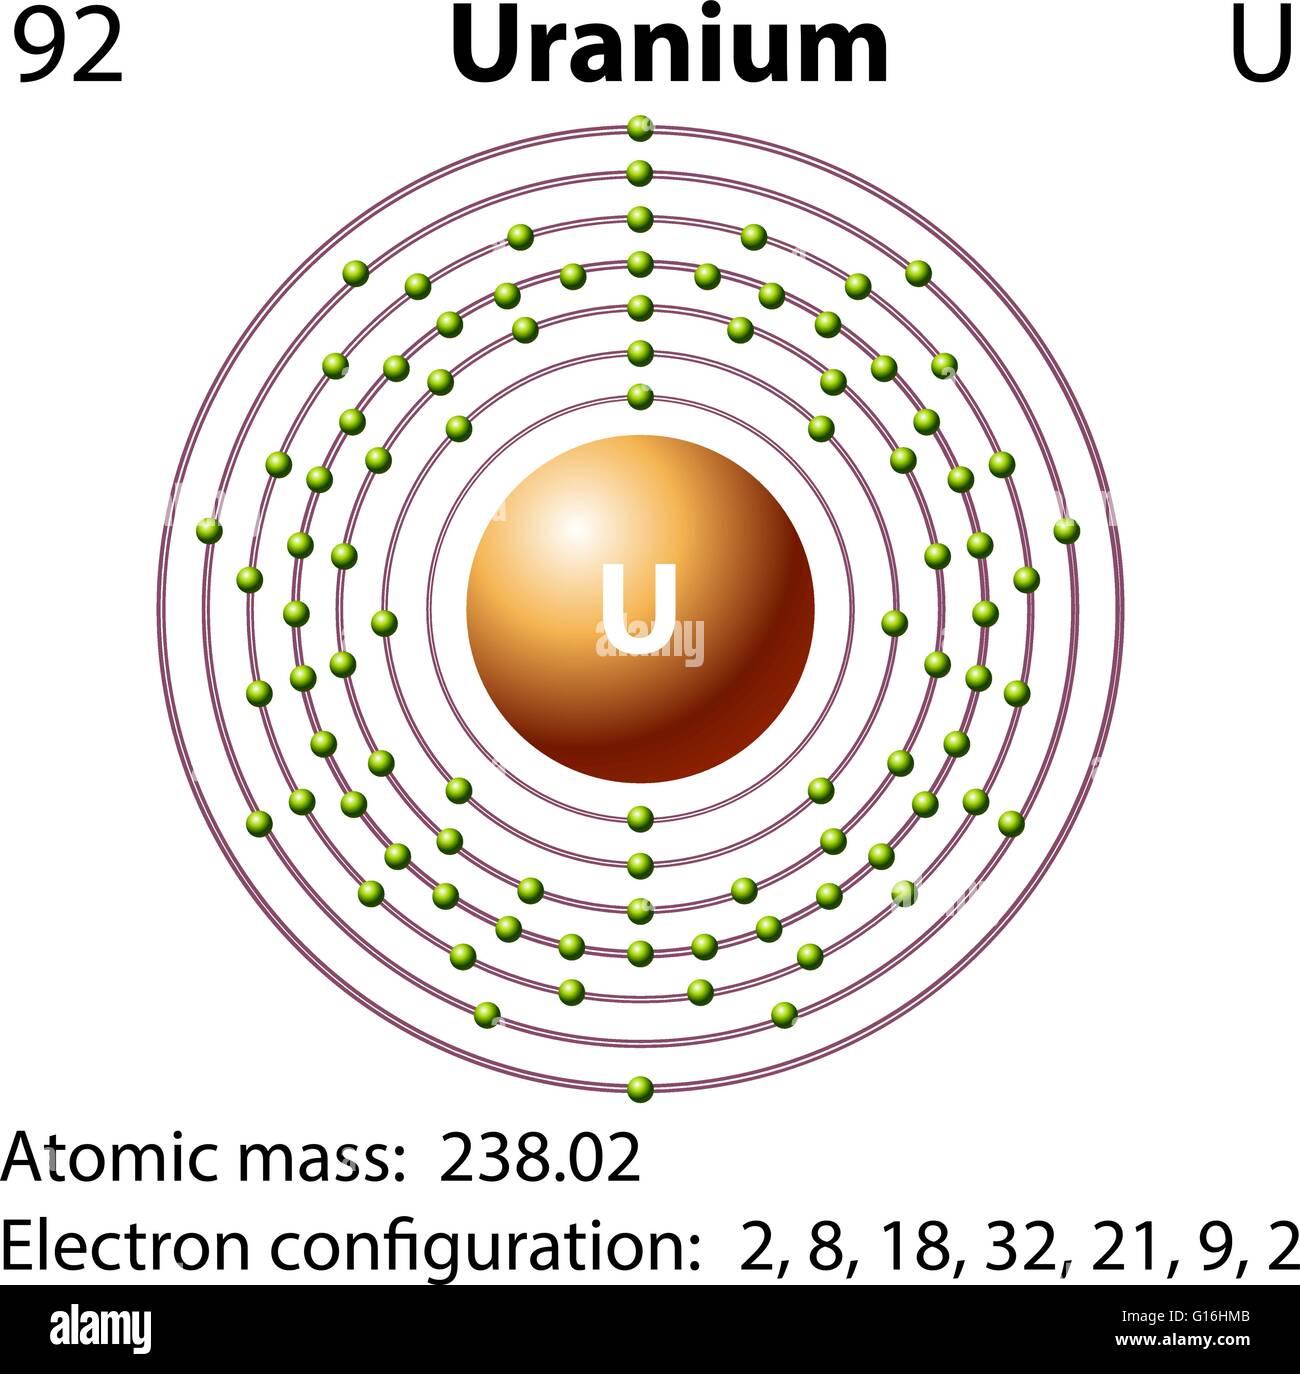 Uranium Electron Cloud Diagram Circuit Connection Bohr For Oxygen Shells Configuration Chemistry Model Atom Stock Photos Images Rh Alamy Com Iron Shell